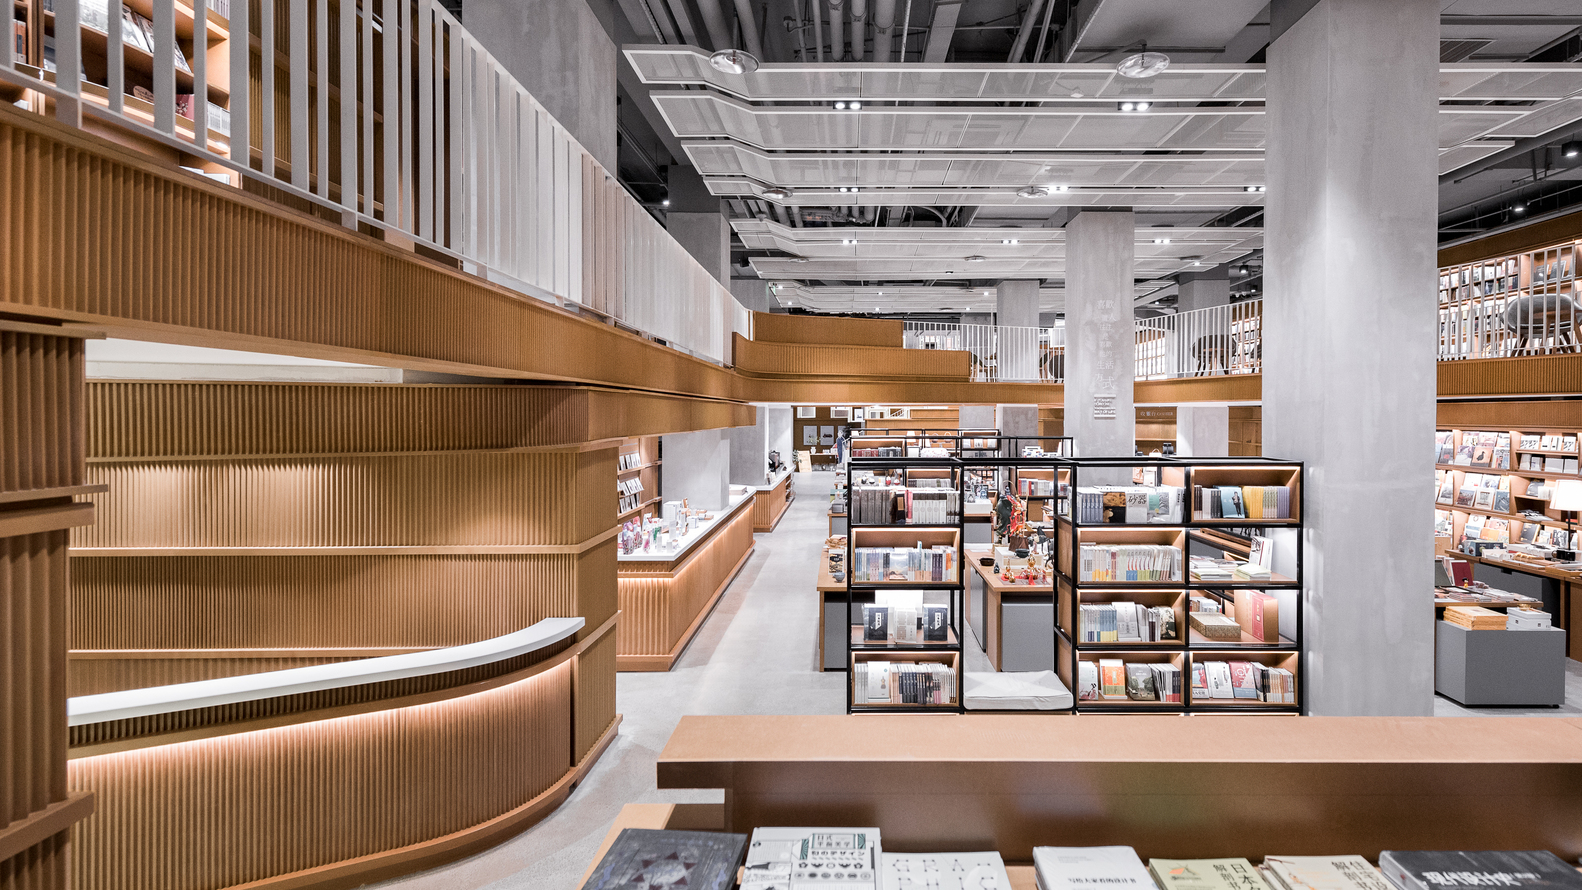 Altlife Bookshop